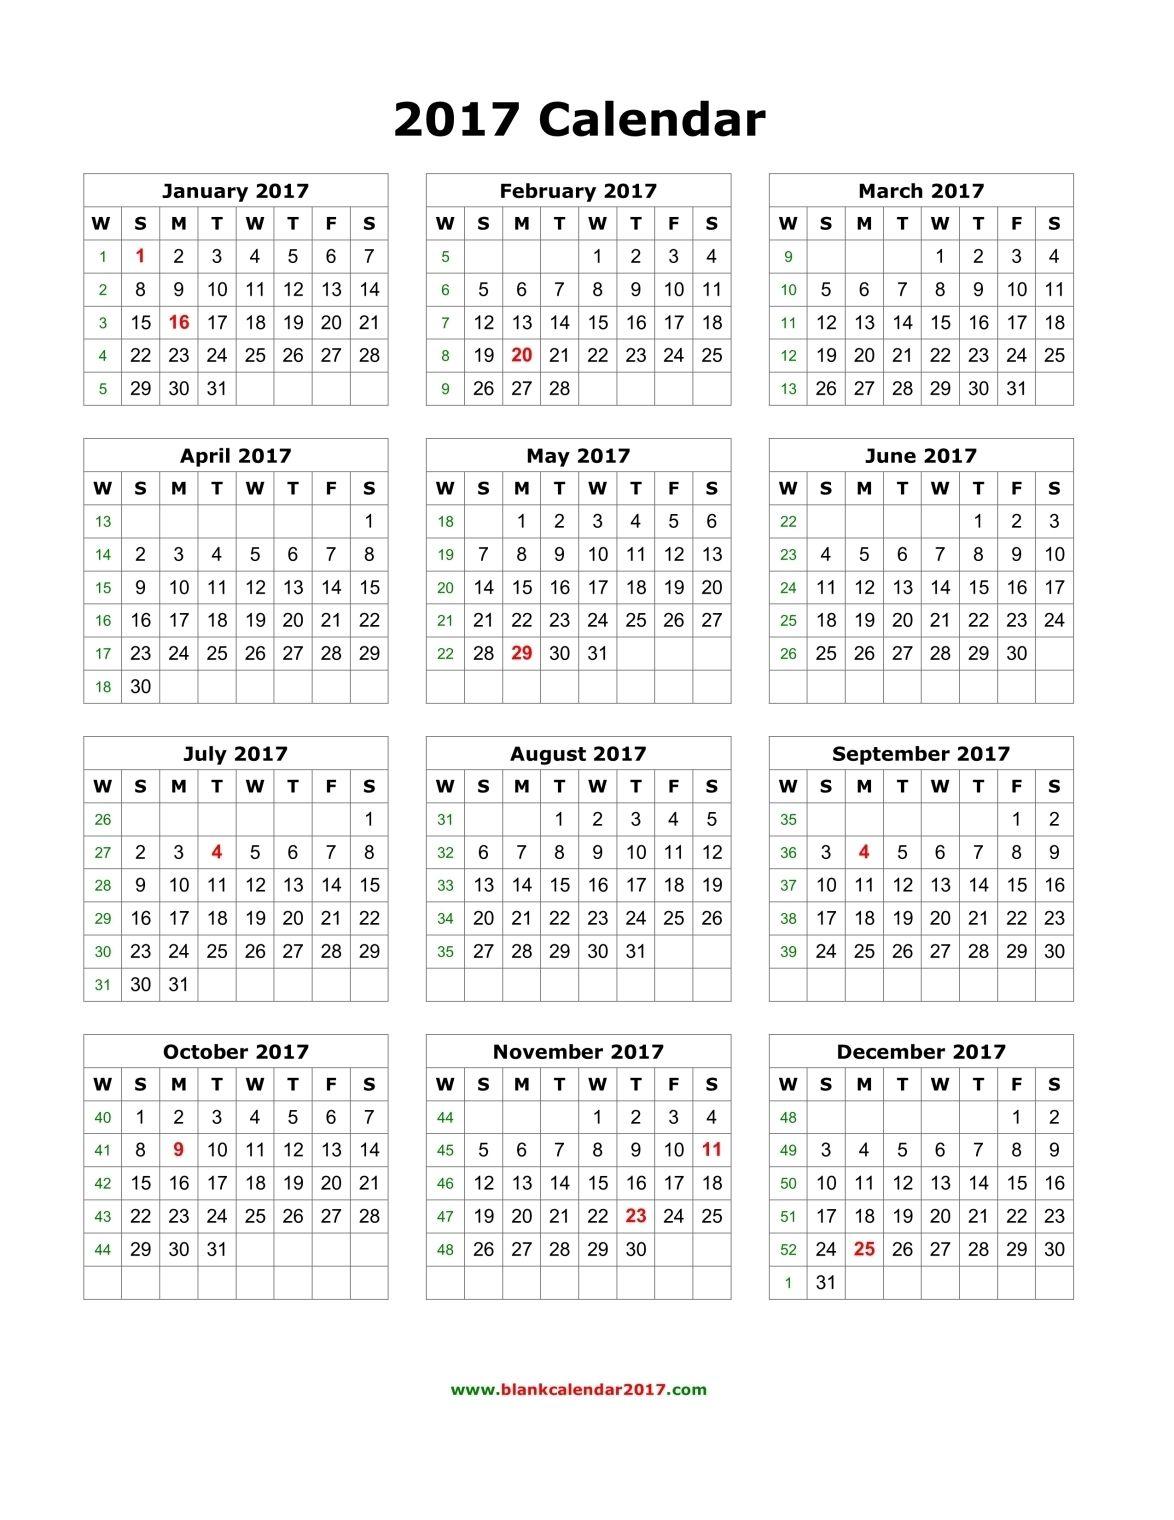 Blank Calendar 2017 Monthly calendar template, Printable